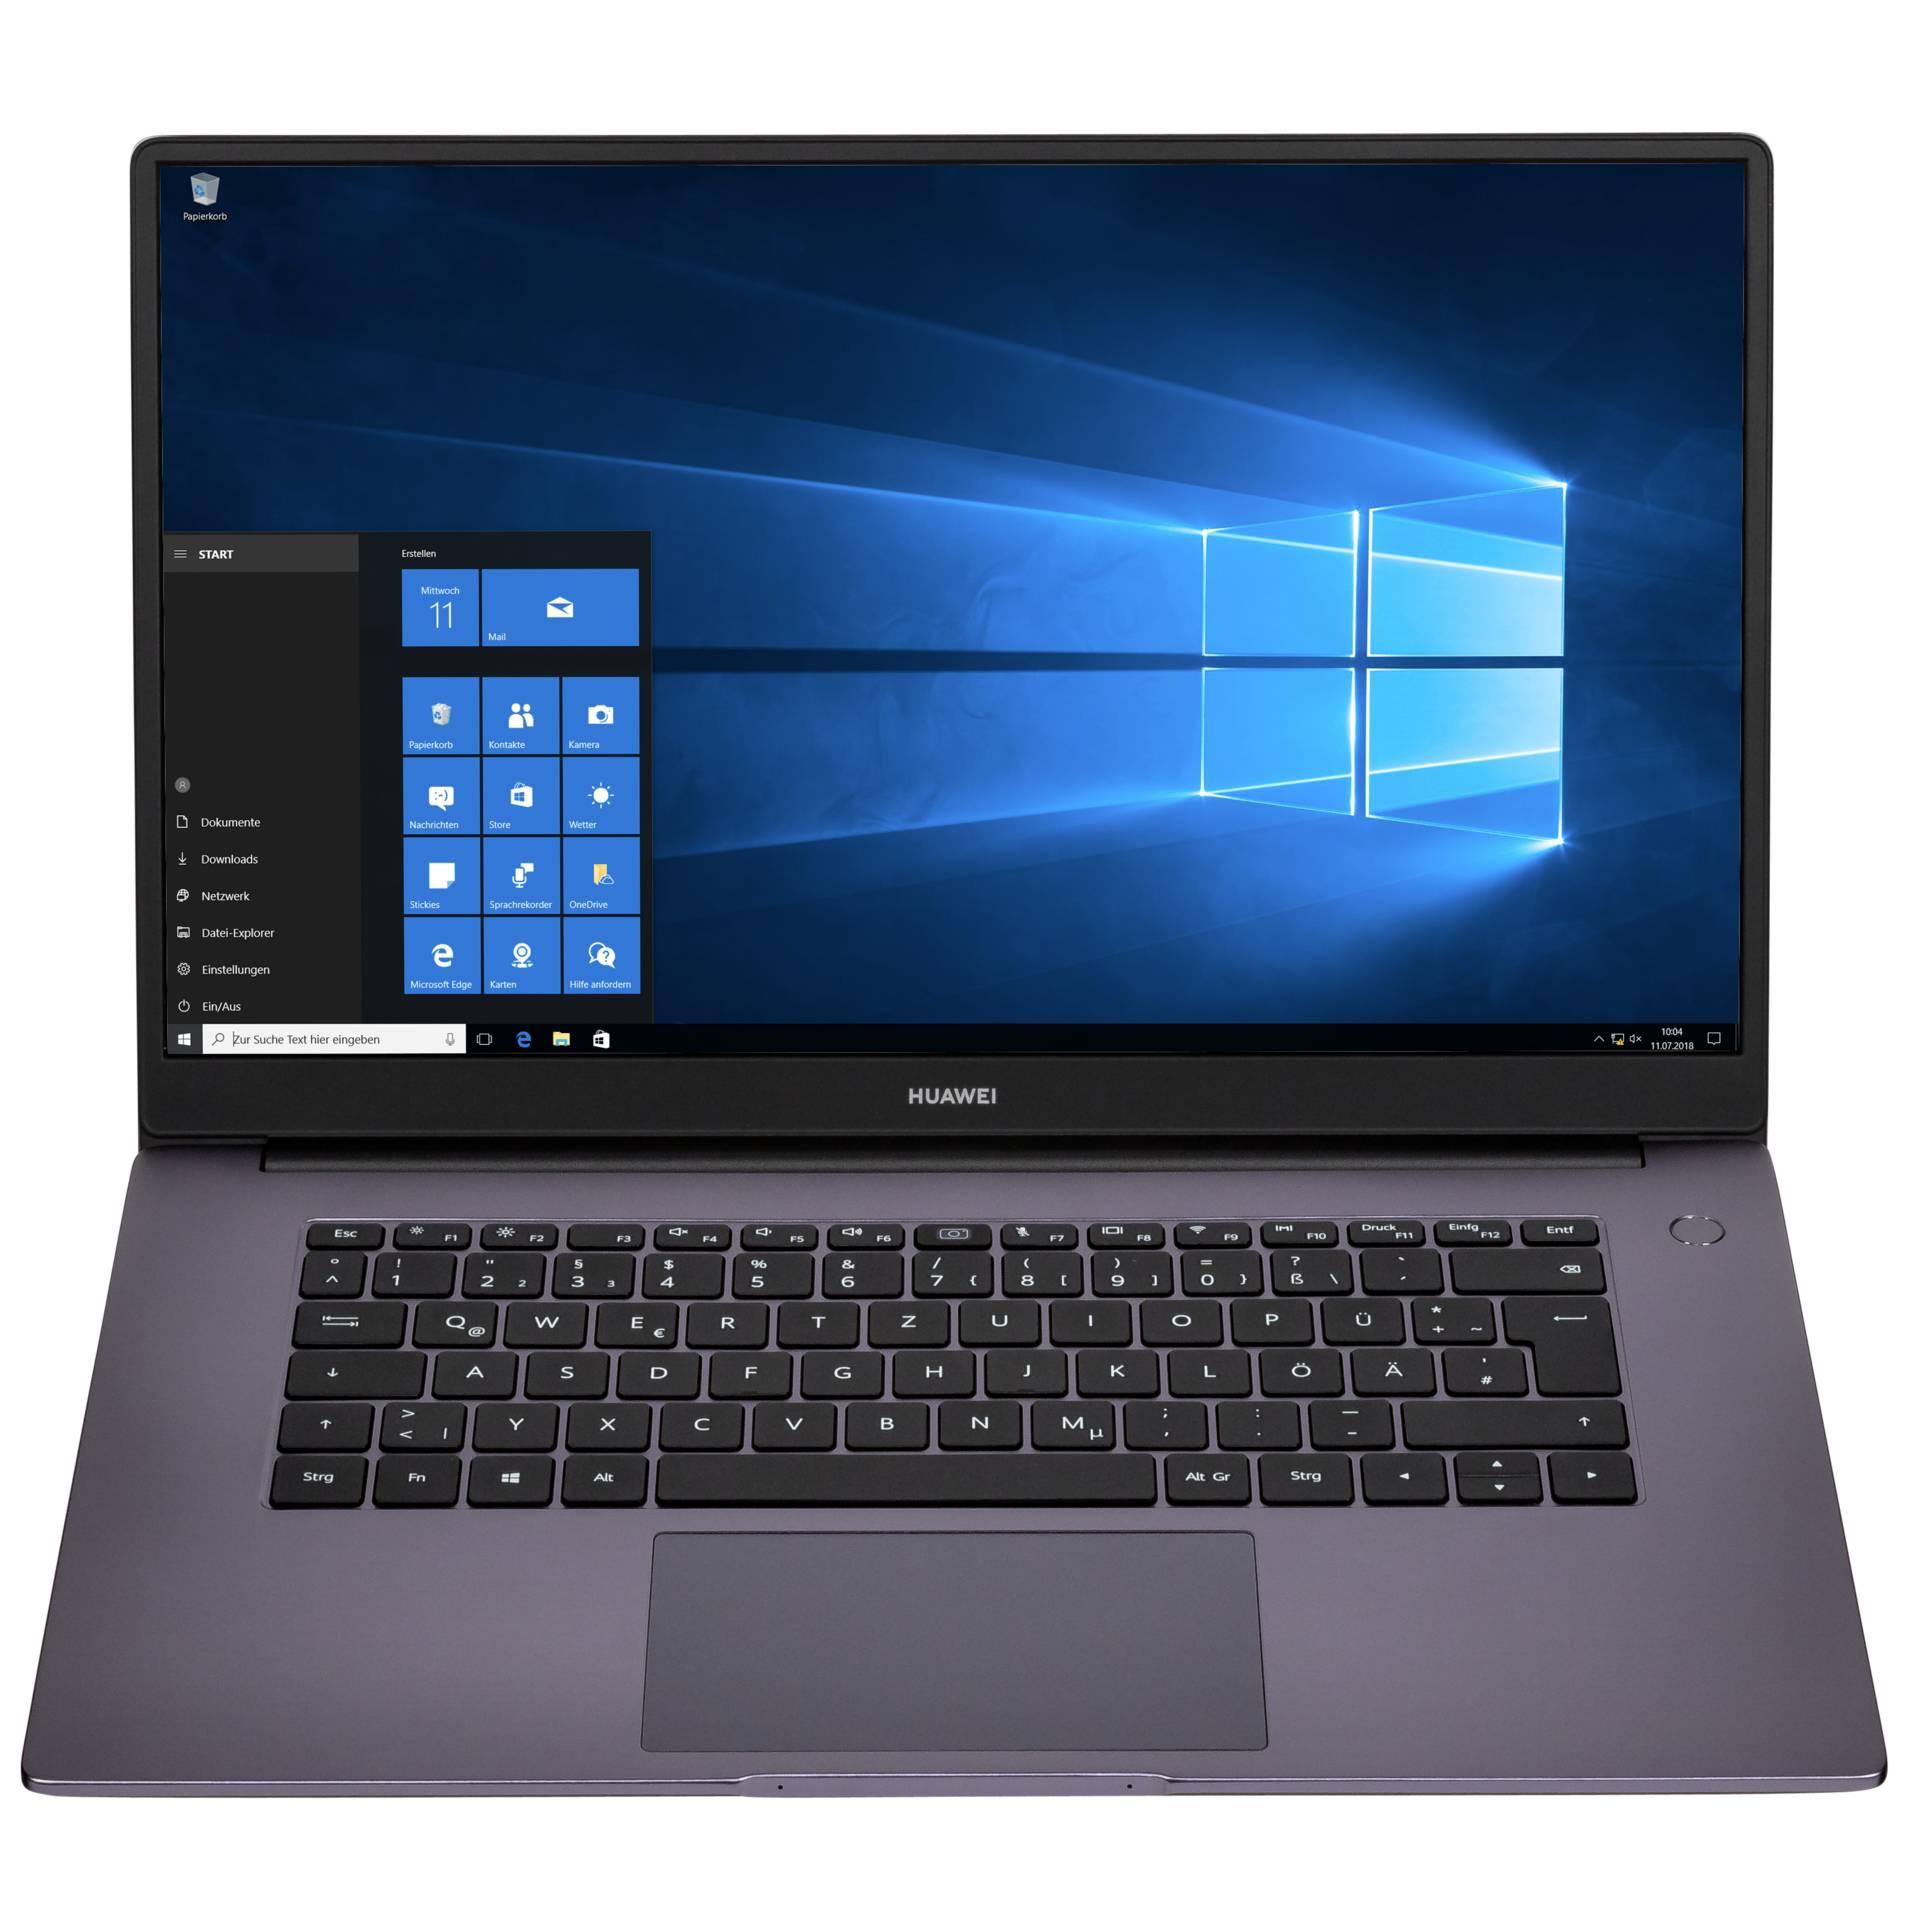 HUAWEI MateBook D15 53010TUY